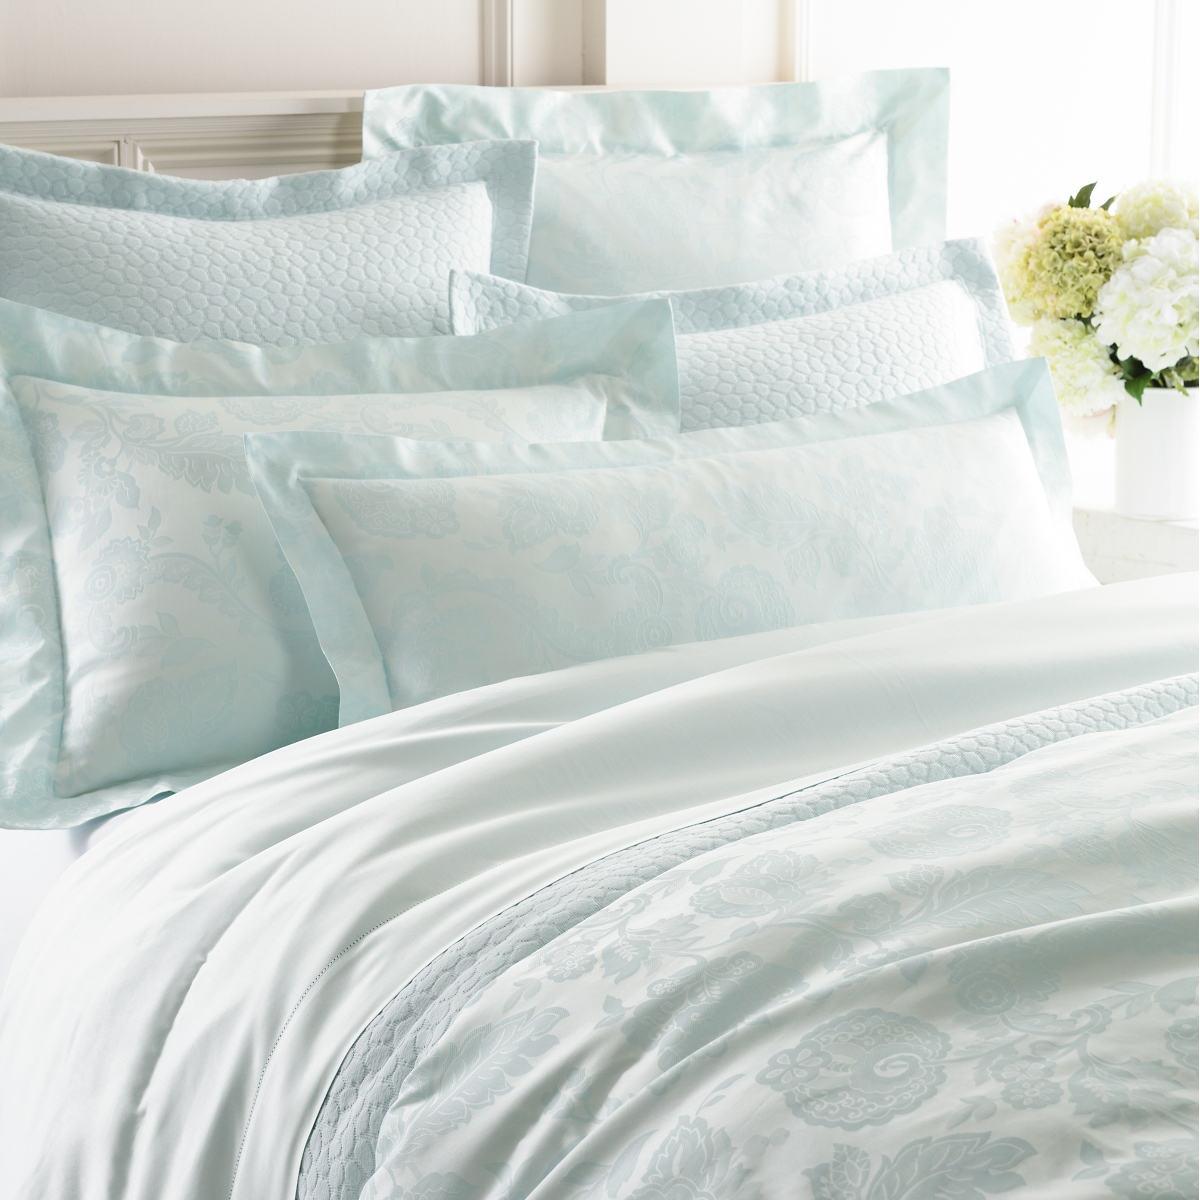 cover product ebisu eclectic blue duvet